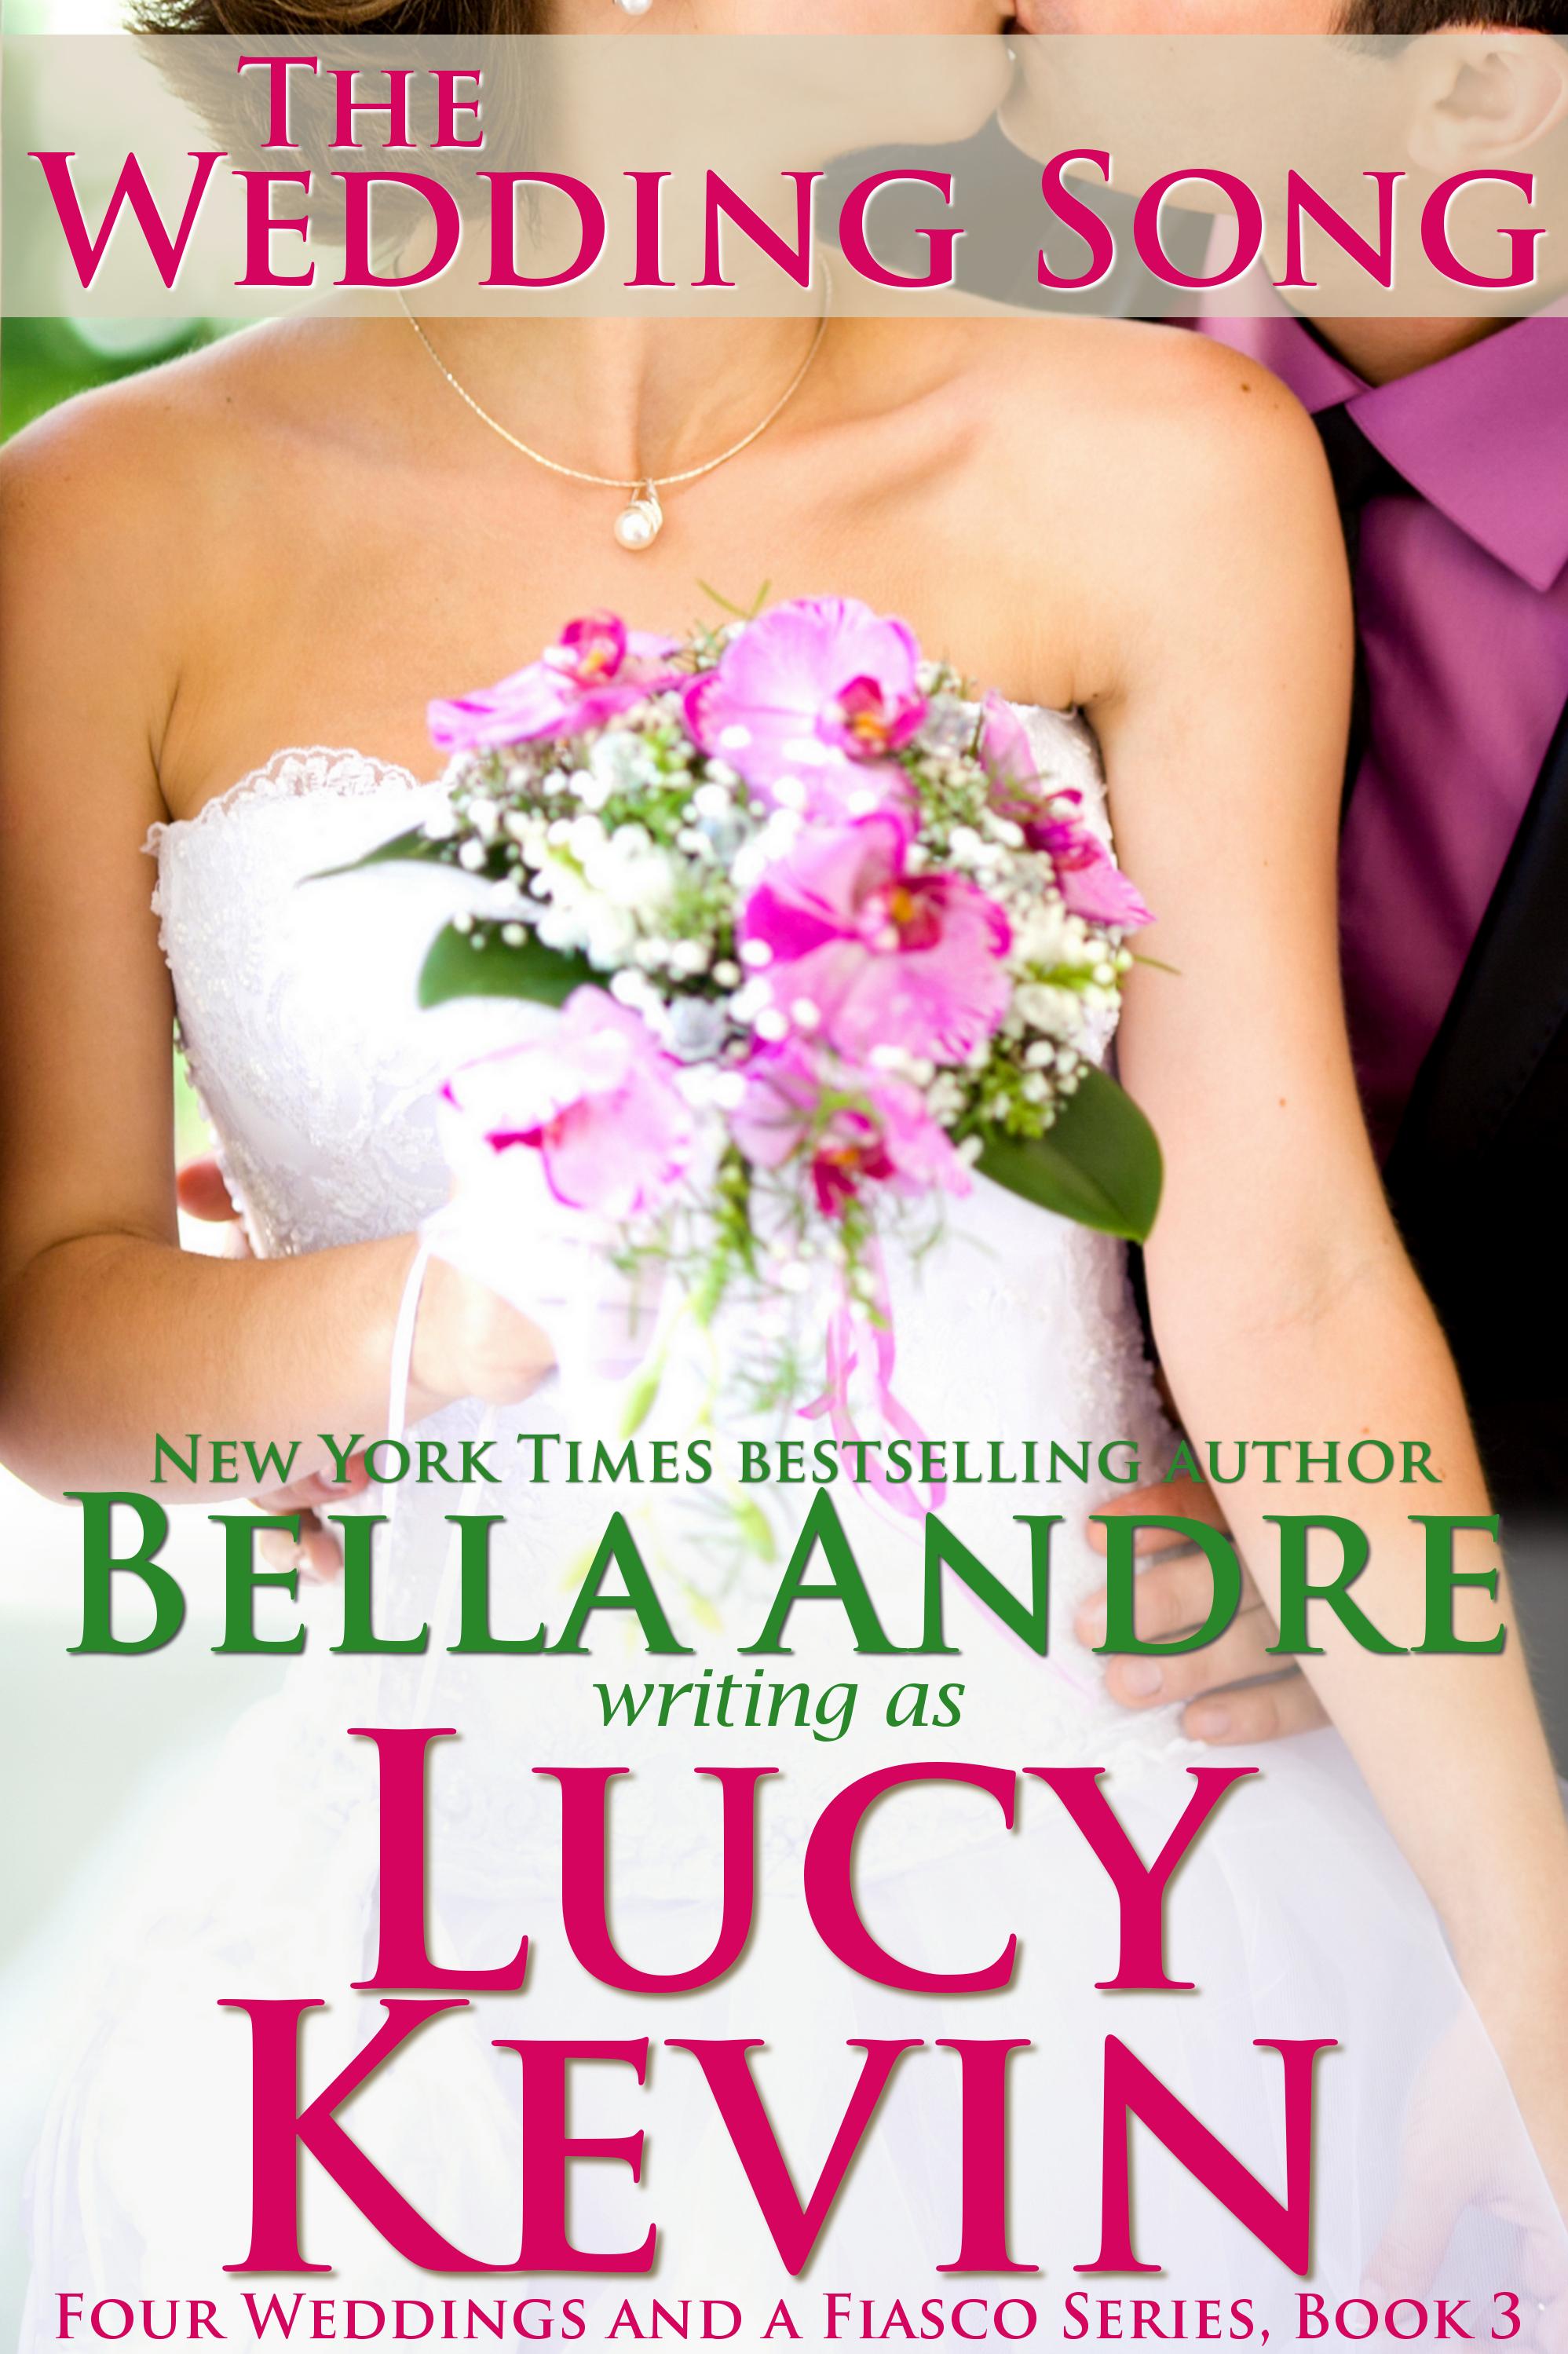 Book 5 The Wedding Kiss